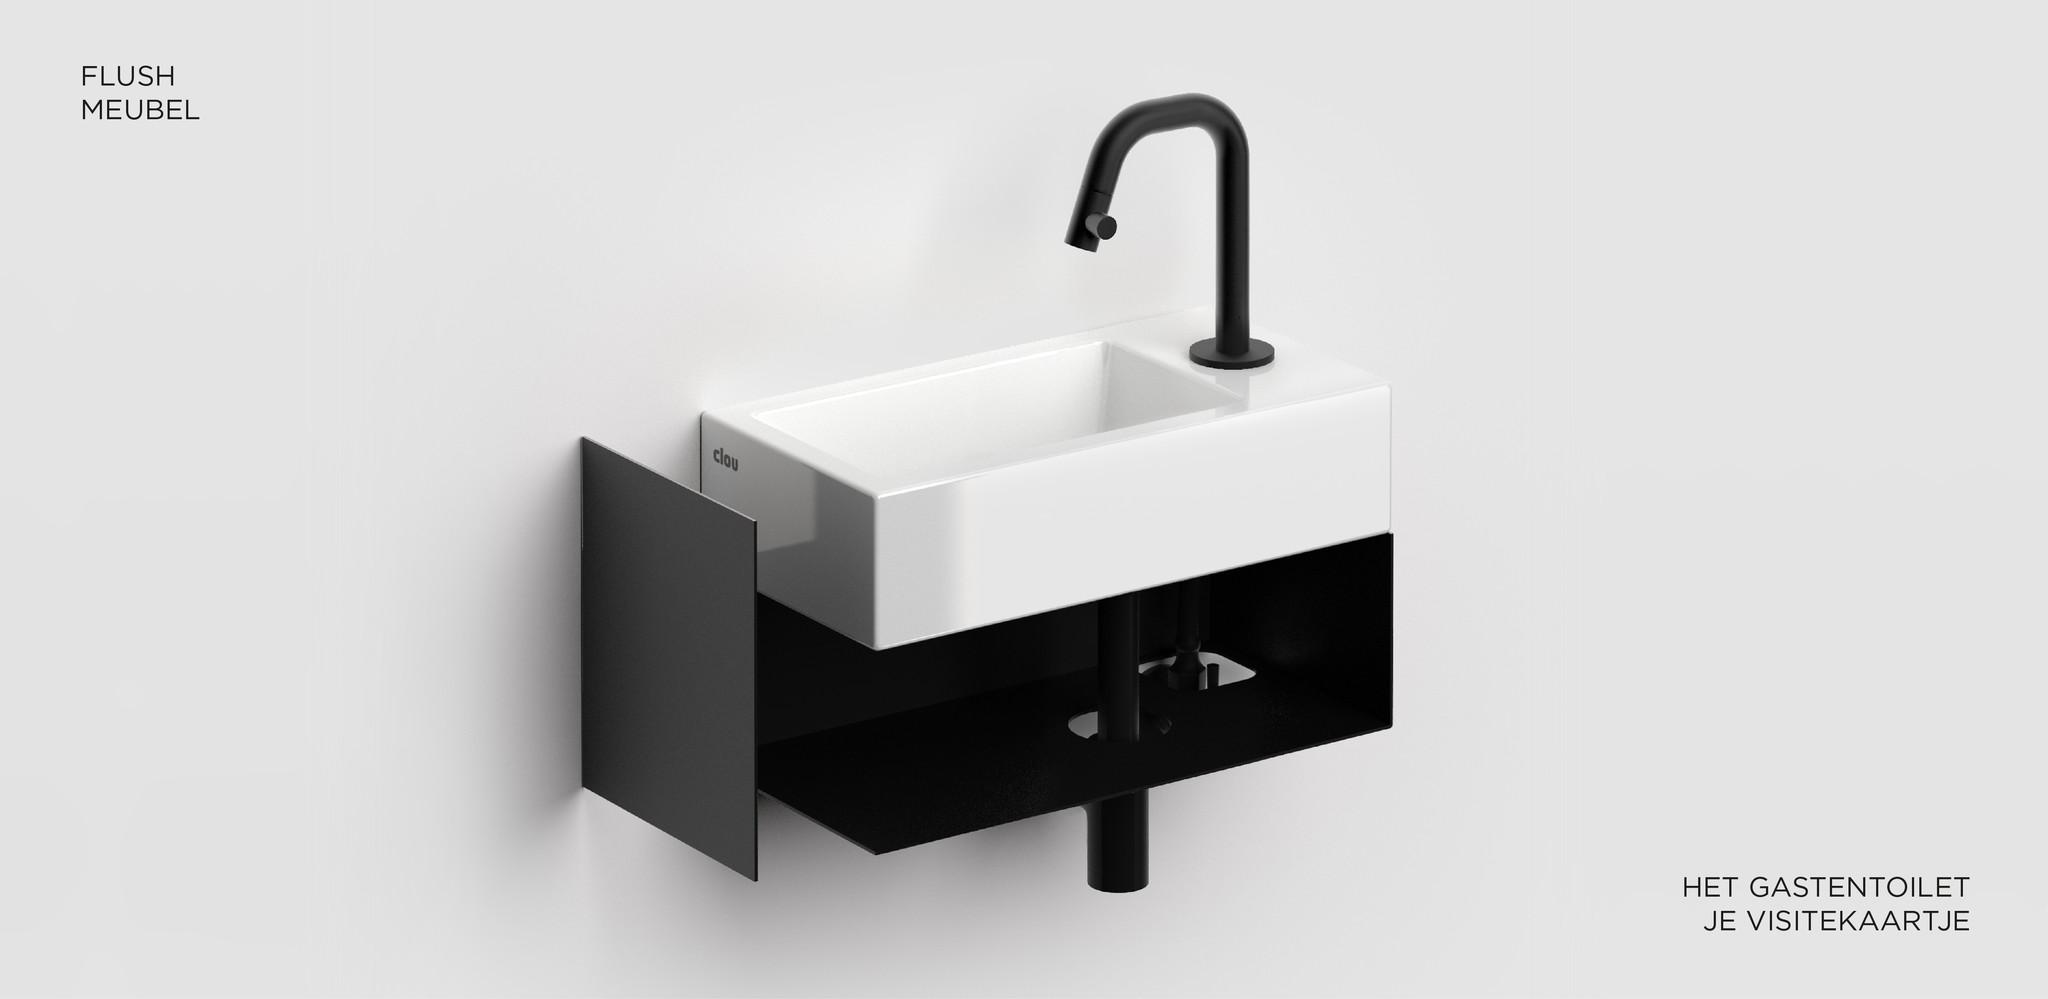 Flush cabinet - NL